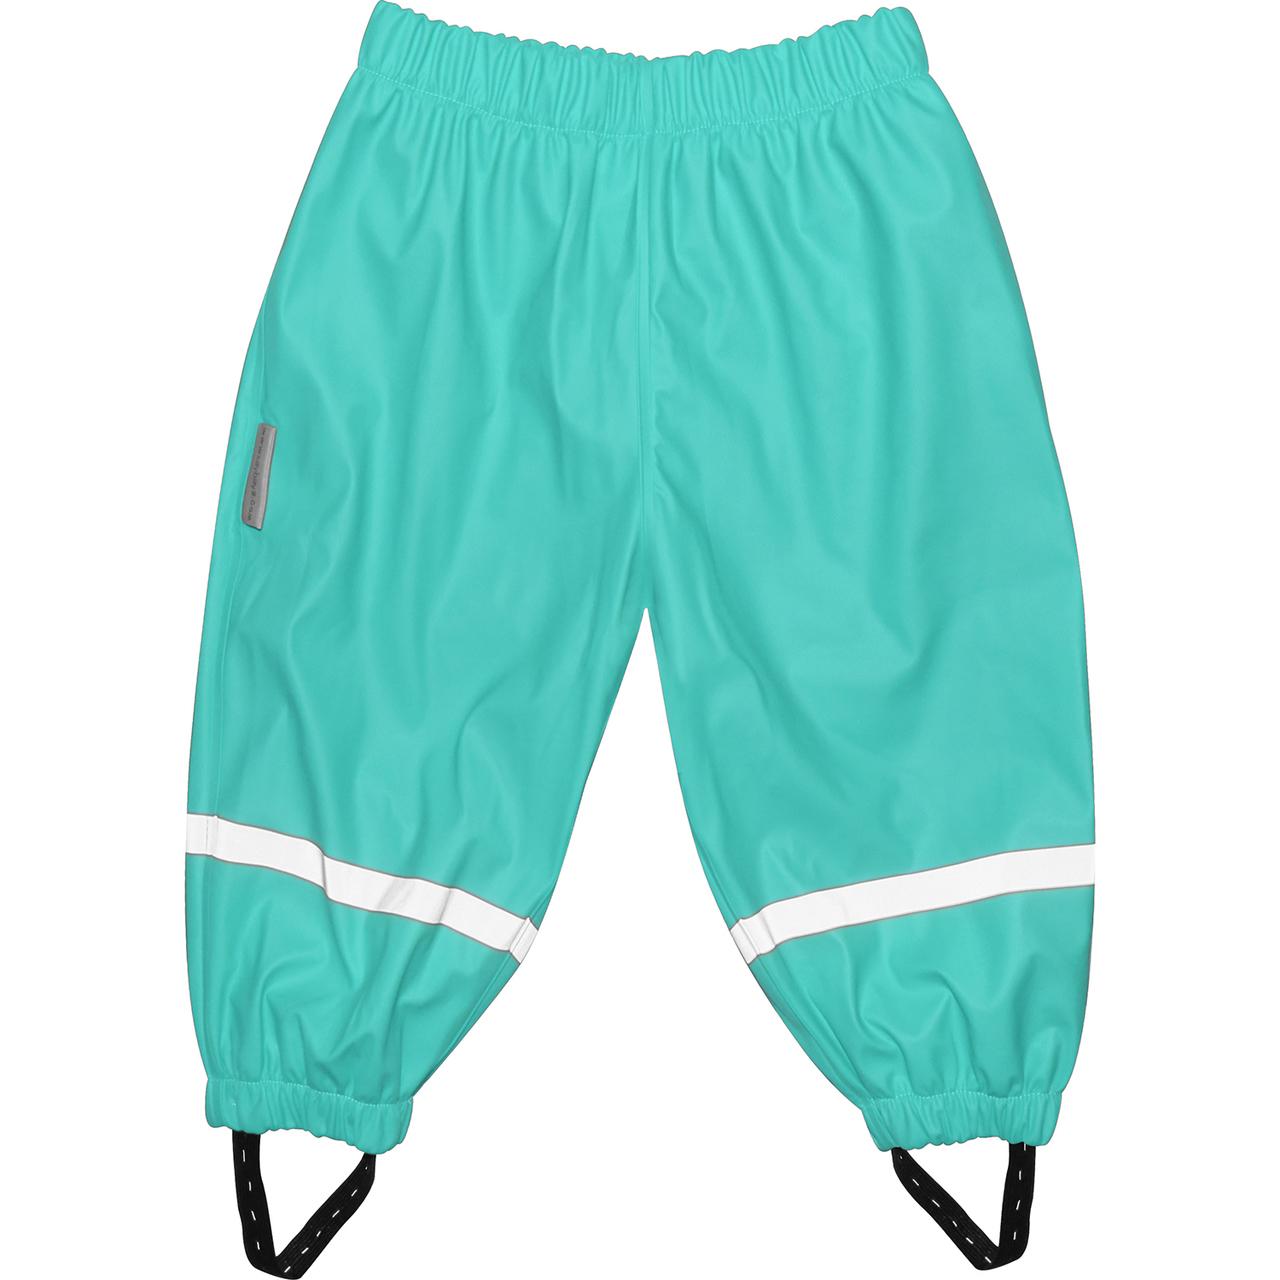 Silly Billyz Waterproof Pants - Aqua (2-3 Yrs) image